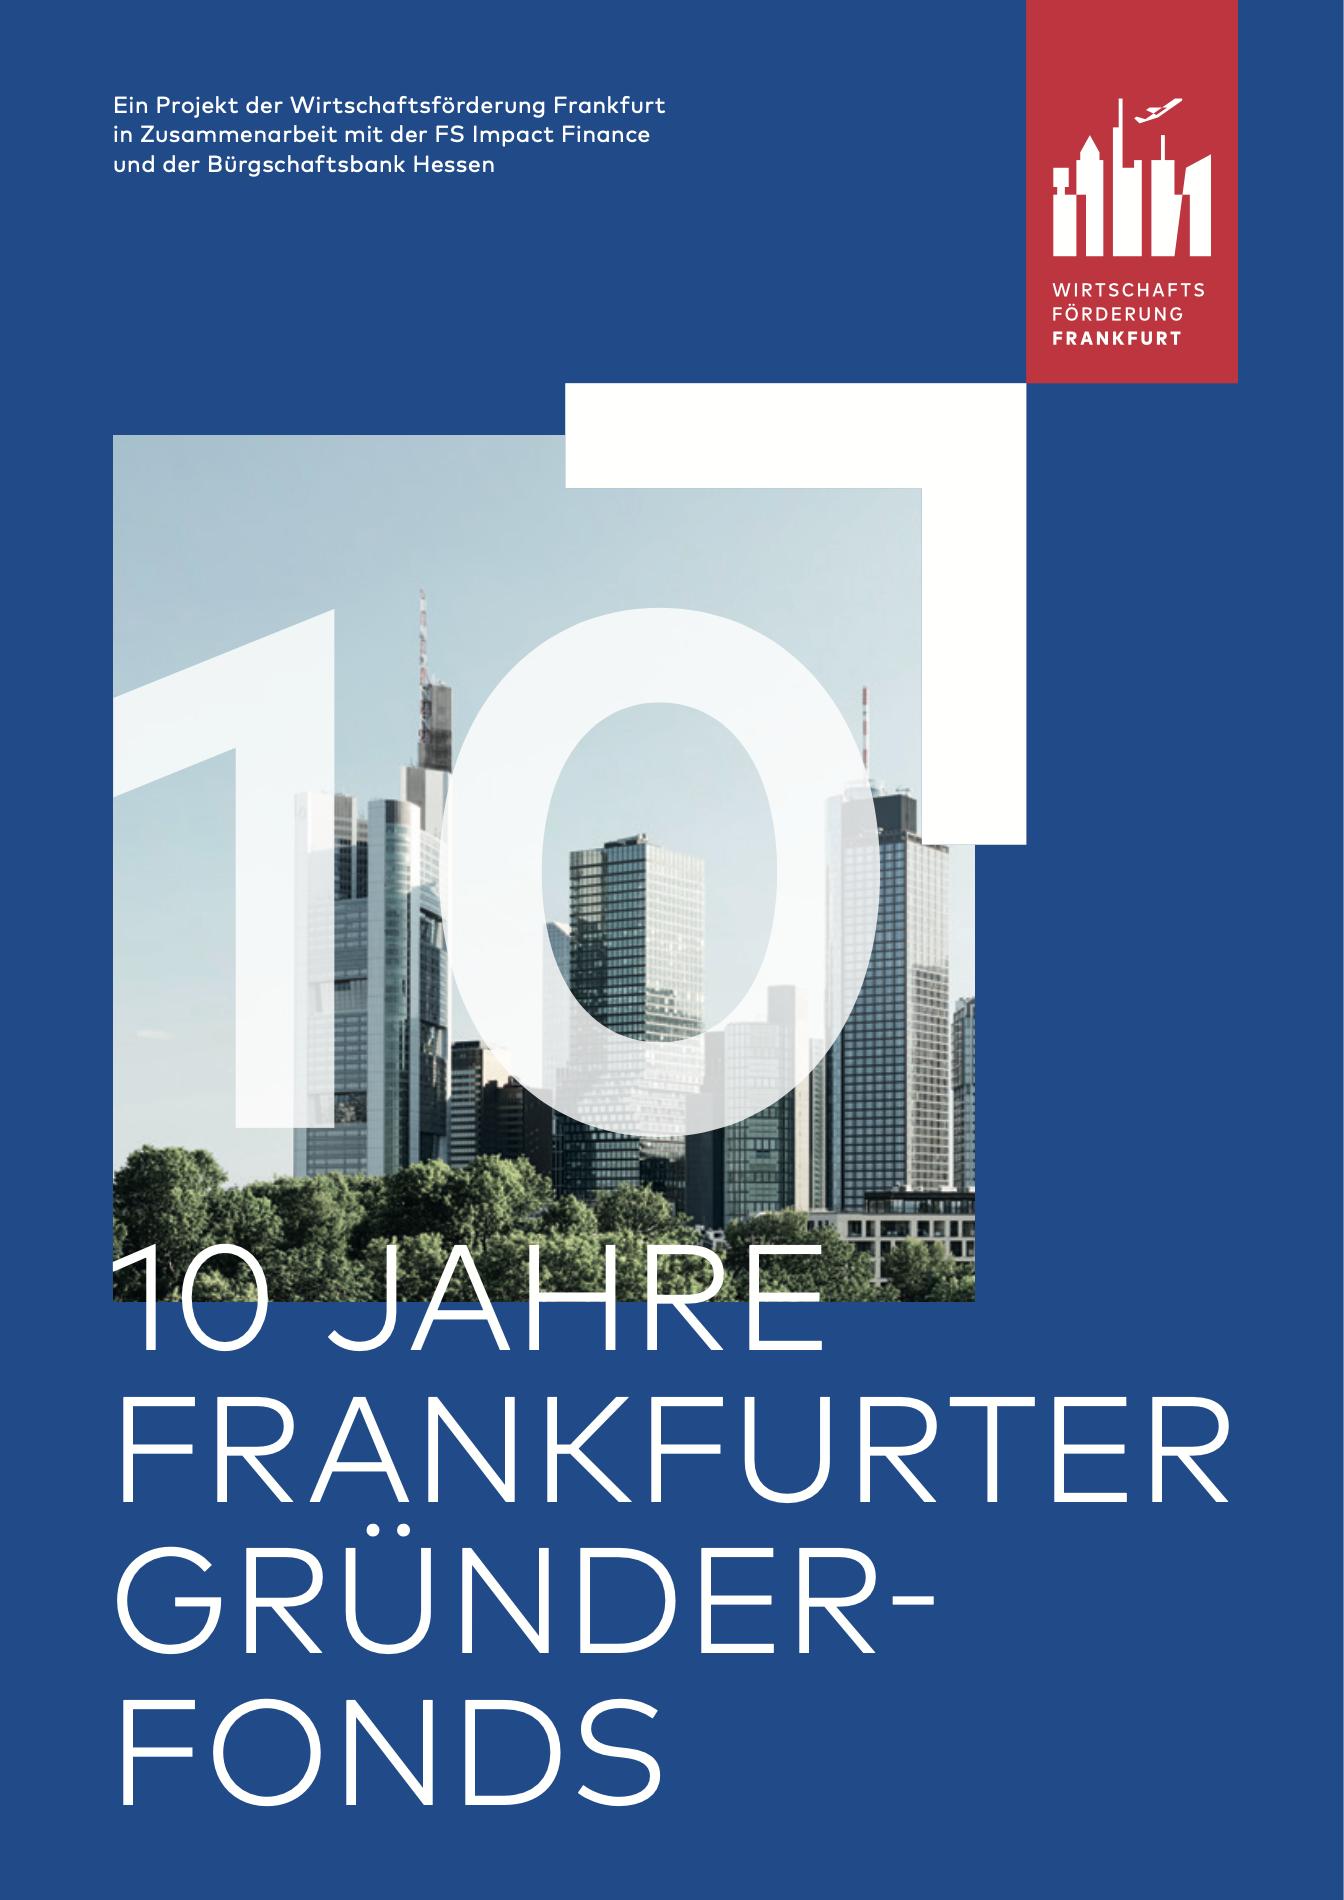 10 Years Of Frankfurter Gründerfonds